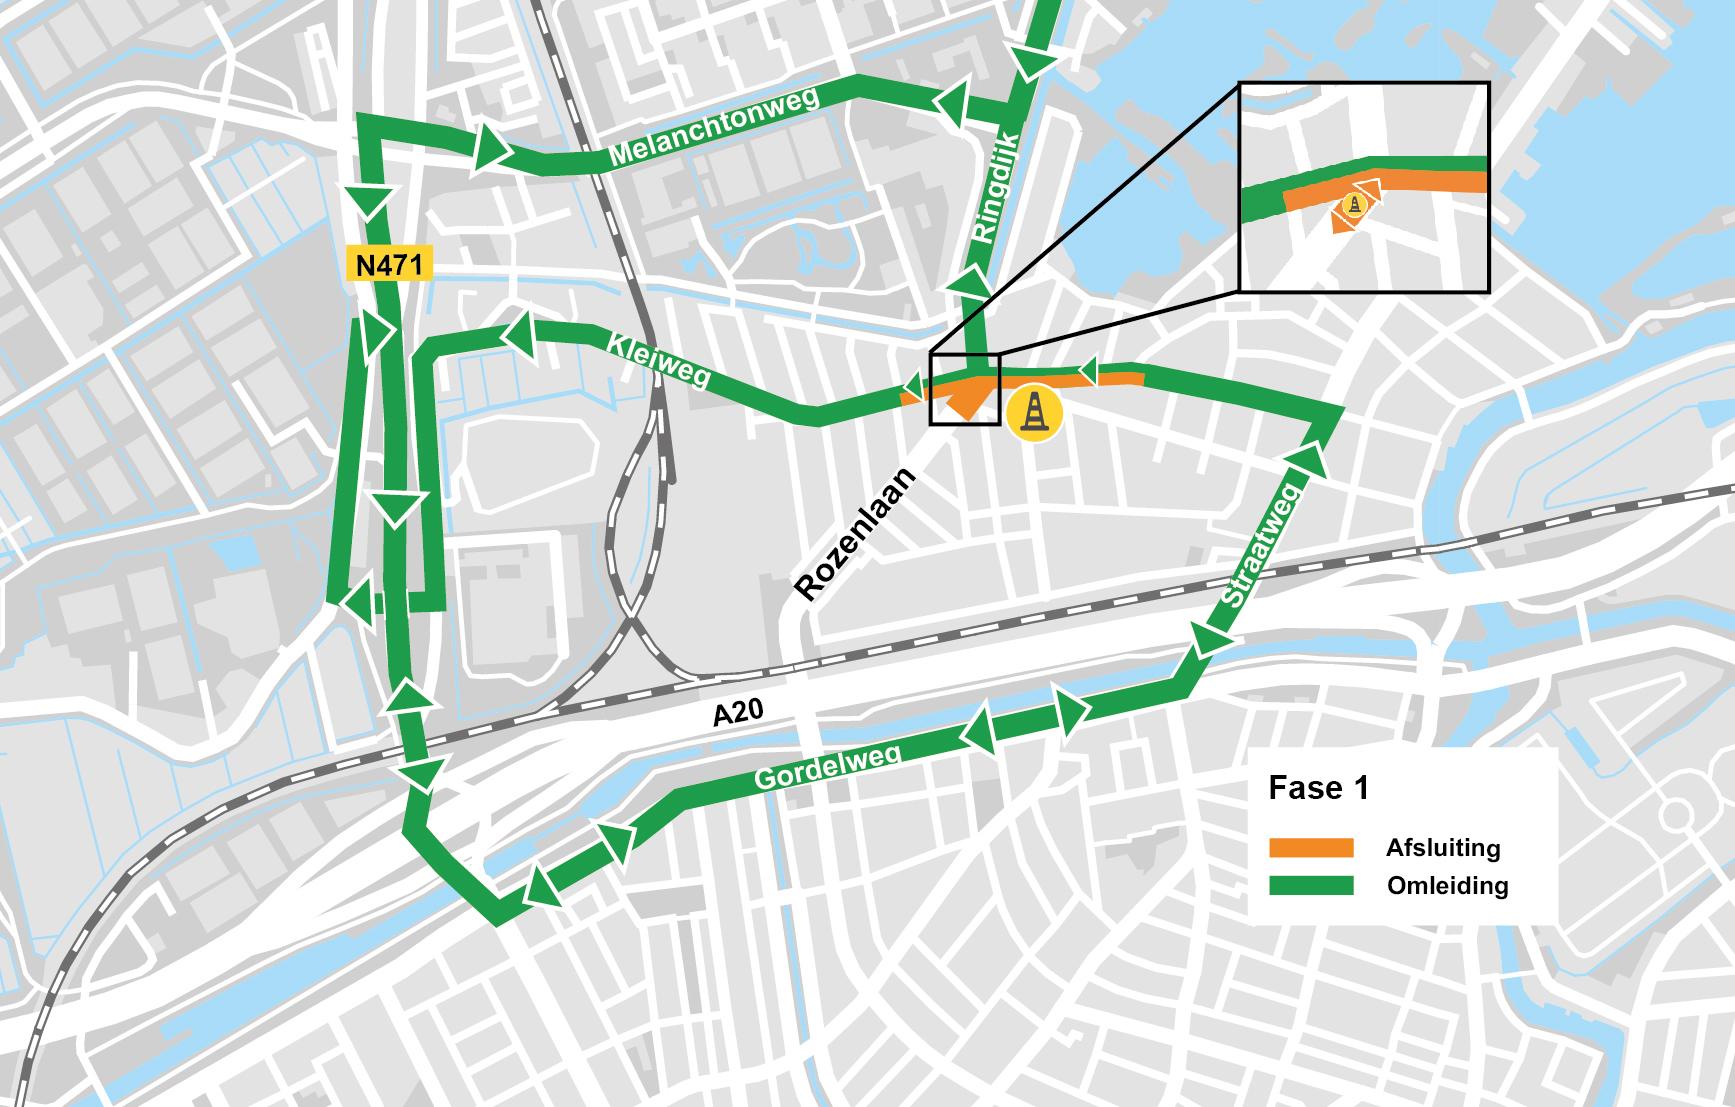 rotterdamonderweg-afsluiting rozenlaan en kleiweg-v4-02.jpg